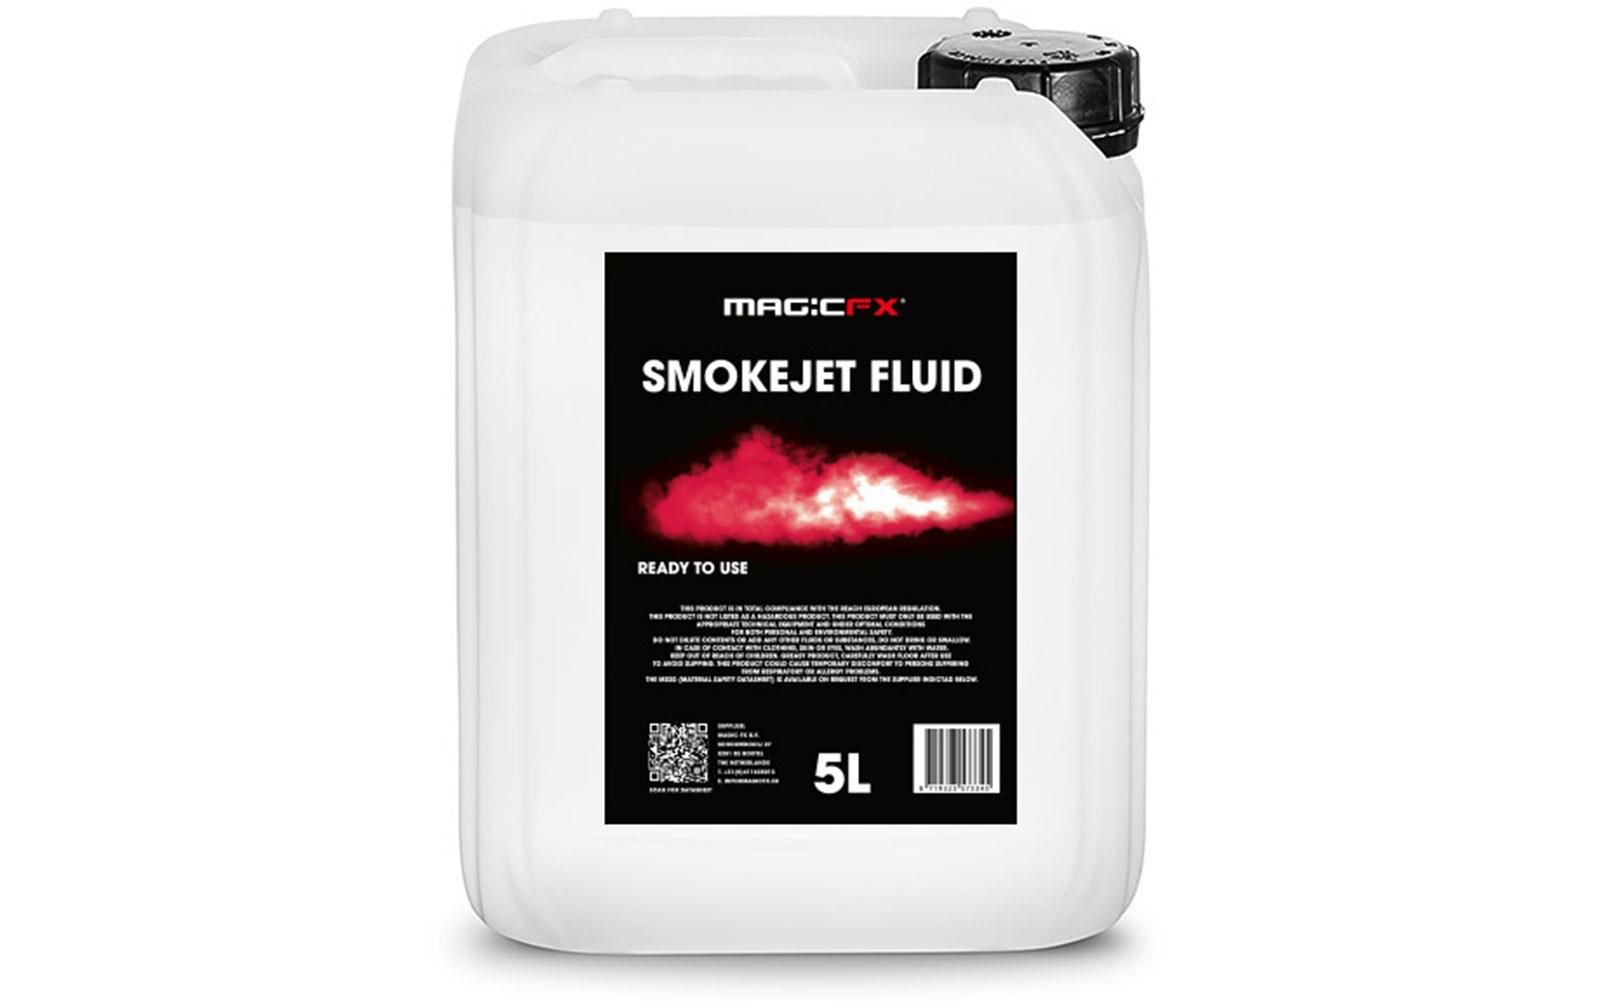 magic-fx-smokejet-fluid-5-liter